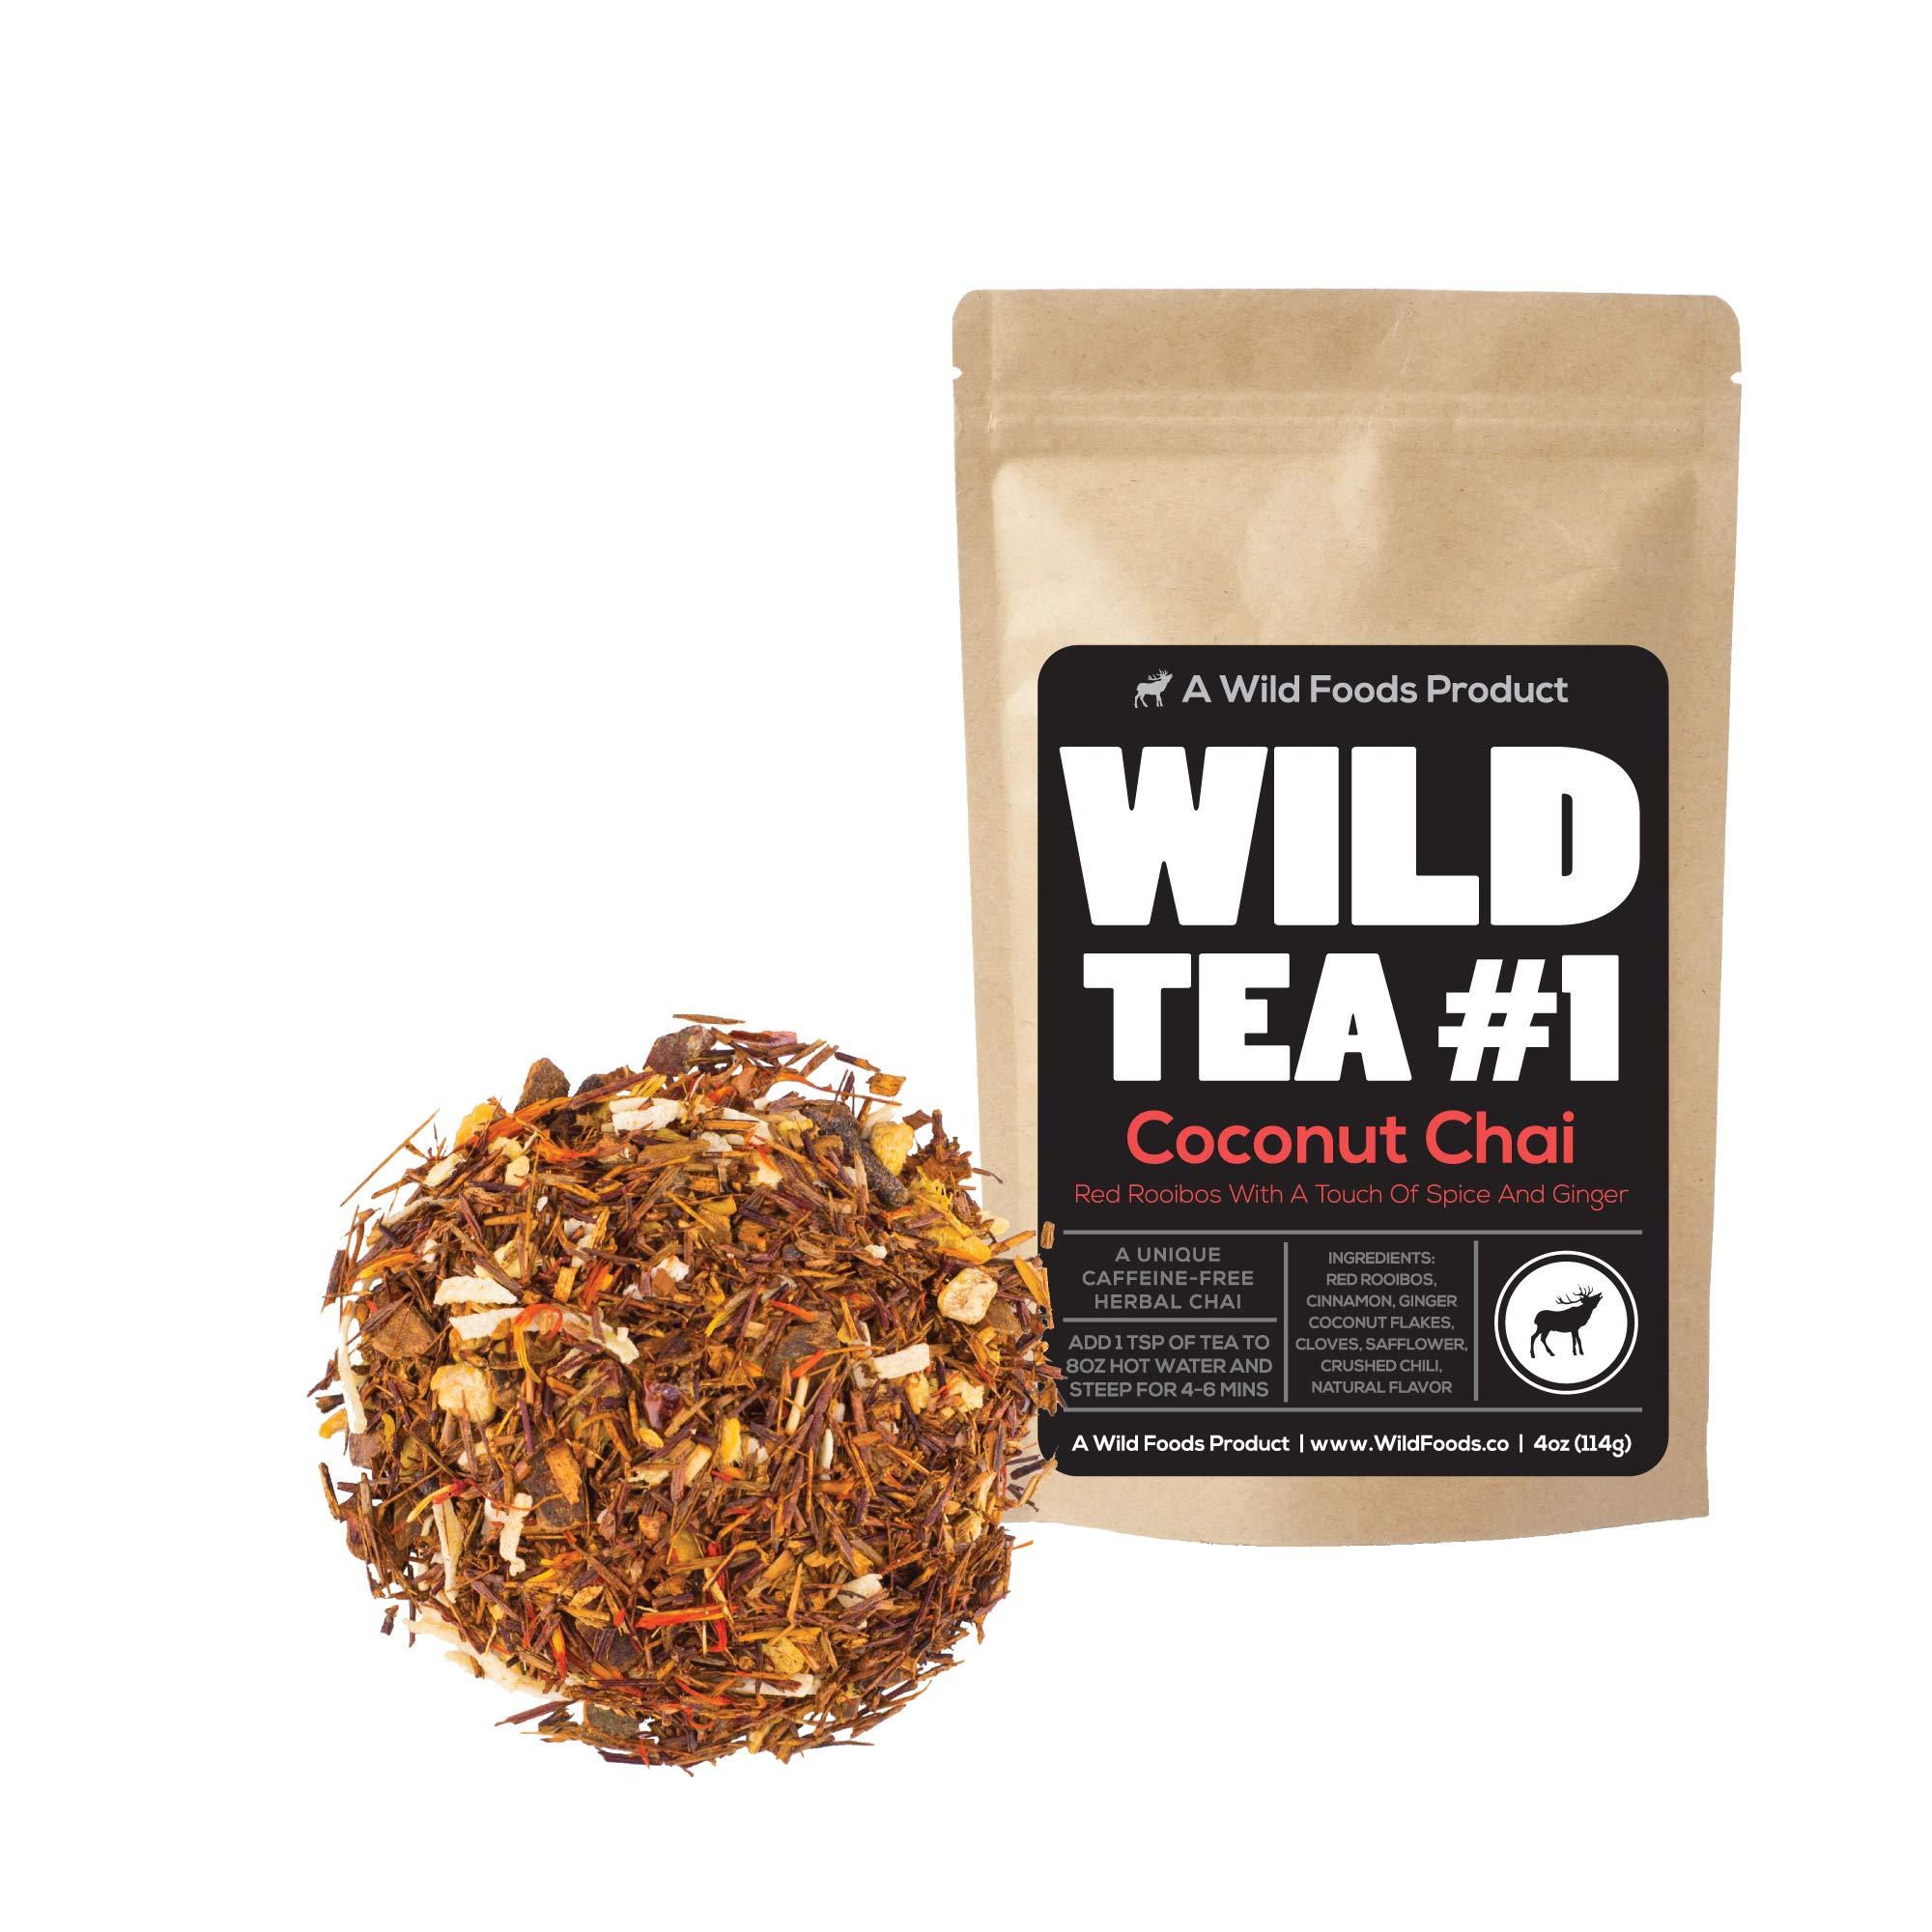 Coconut Chai, Rooibos Loose Leaf Tea Blend, 100% Naturally Grown Ingredients - Wild Tea #1 Herbal Chai Tea (8 ounce)